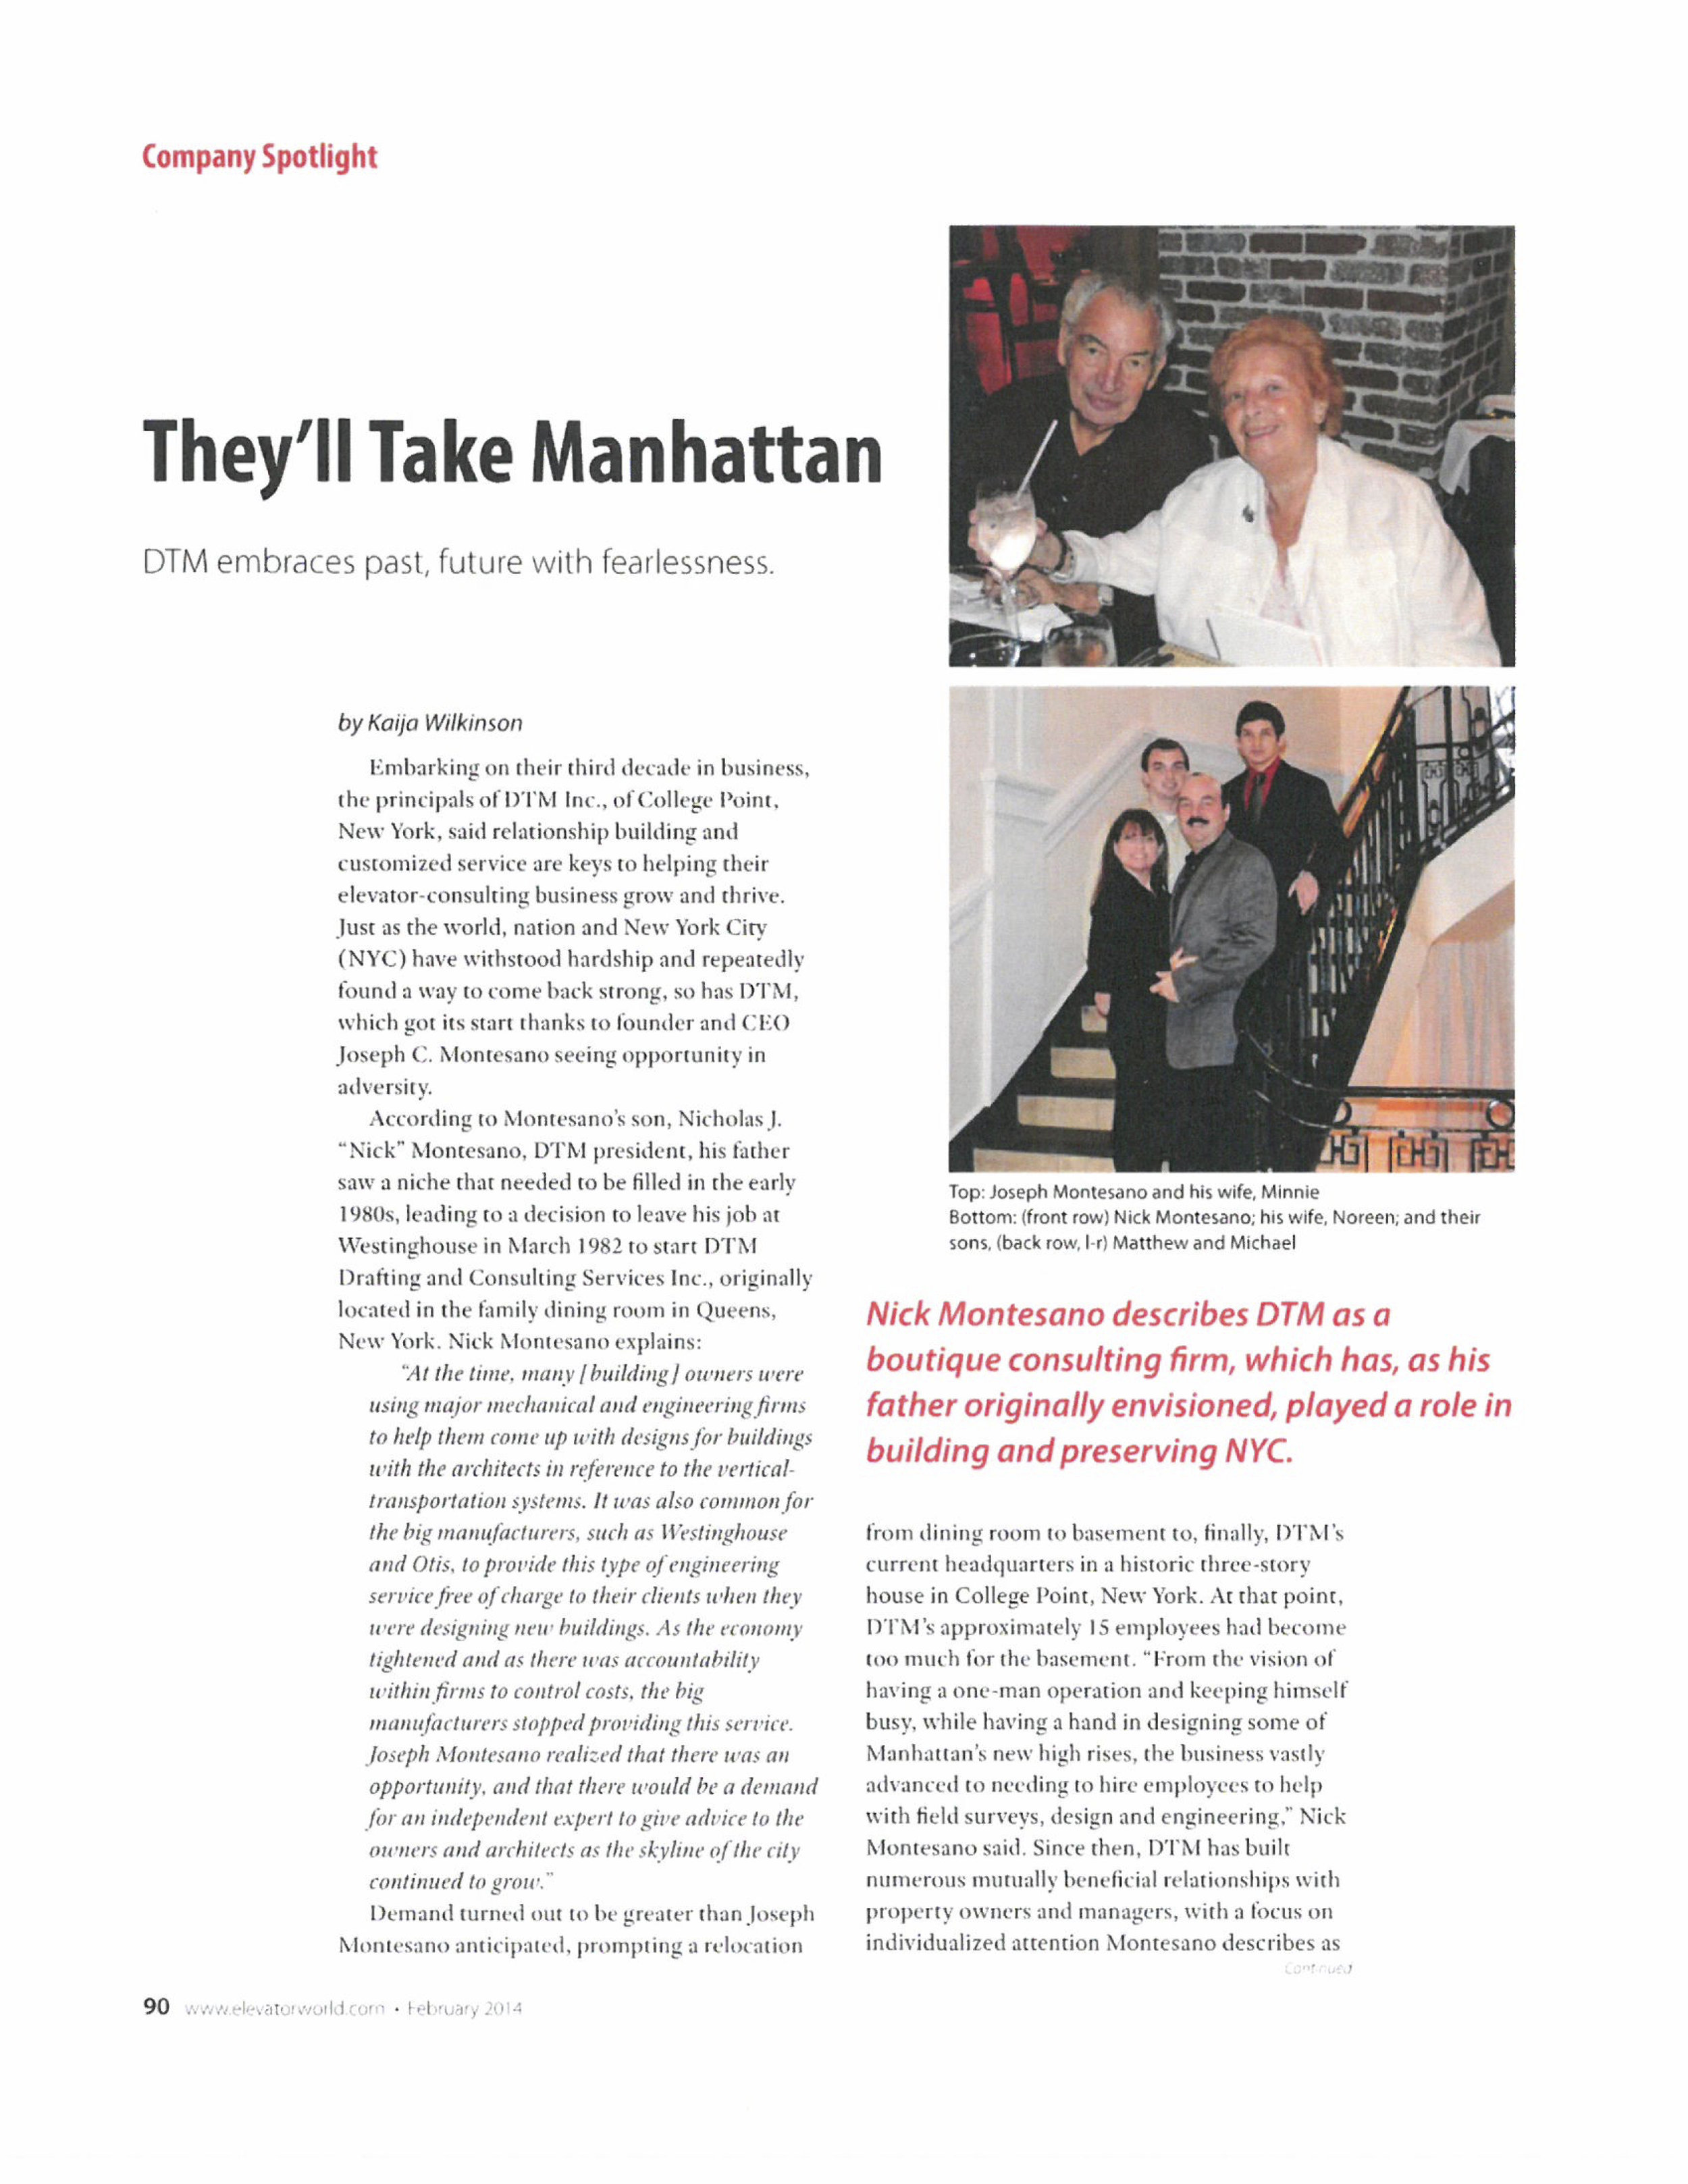 Elevator World Article on DTM 2014.jpg